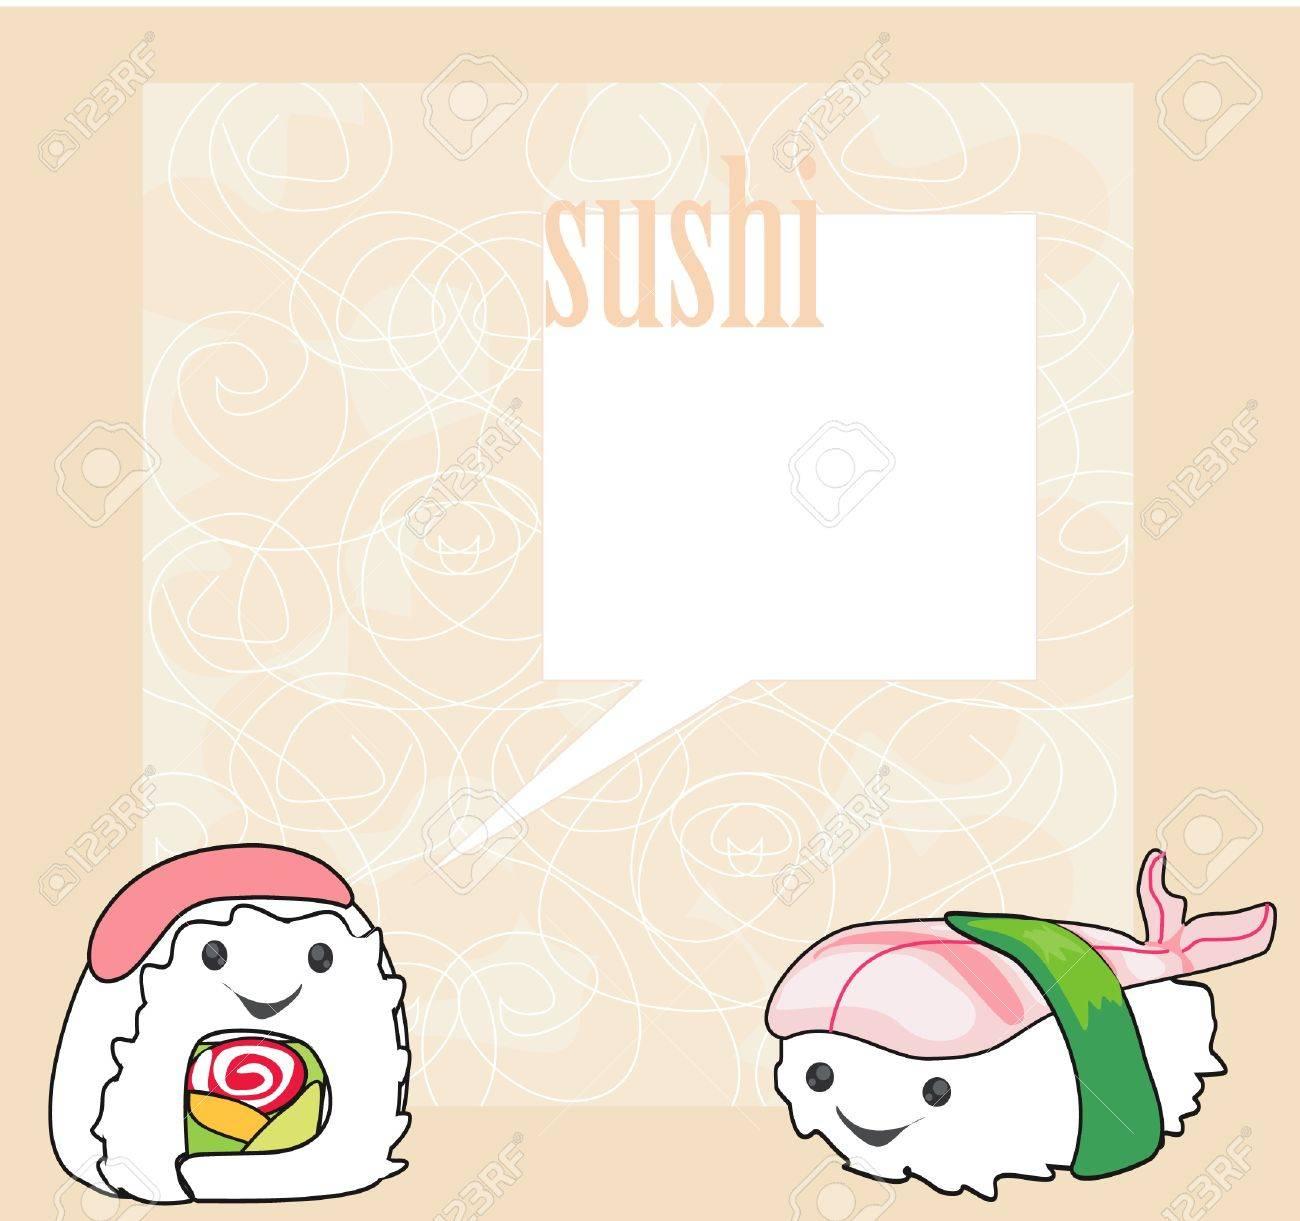 cute sushi cartoon illustration - vector card Stock Vector - 11978694